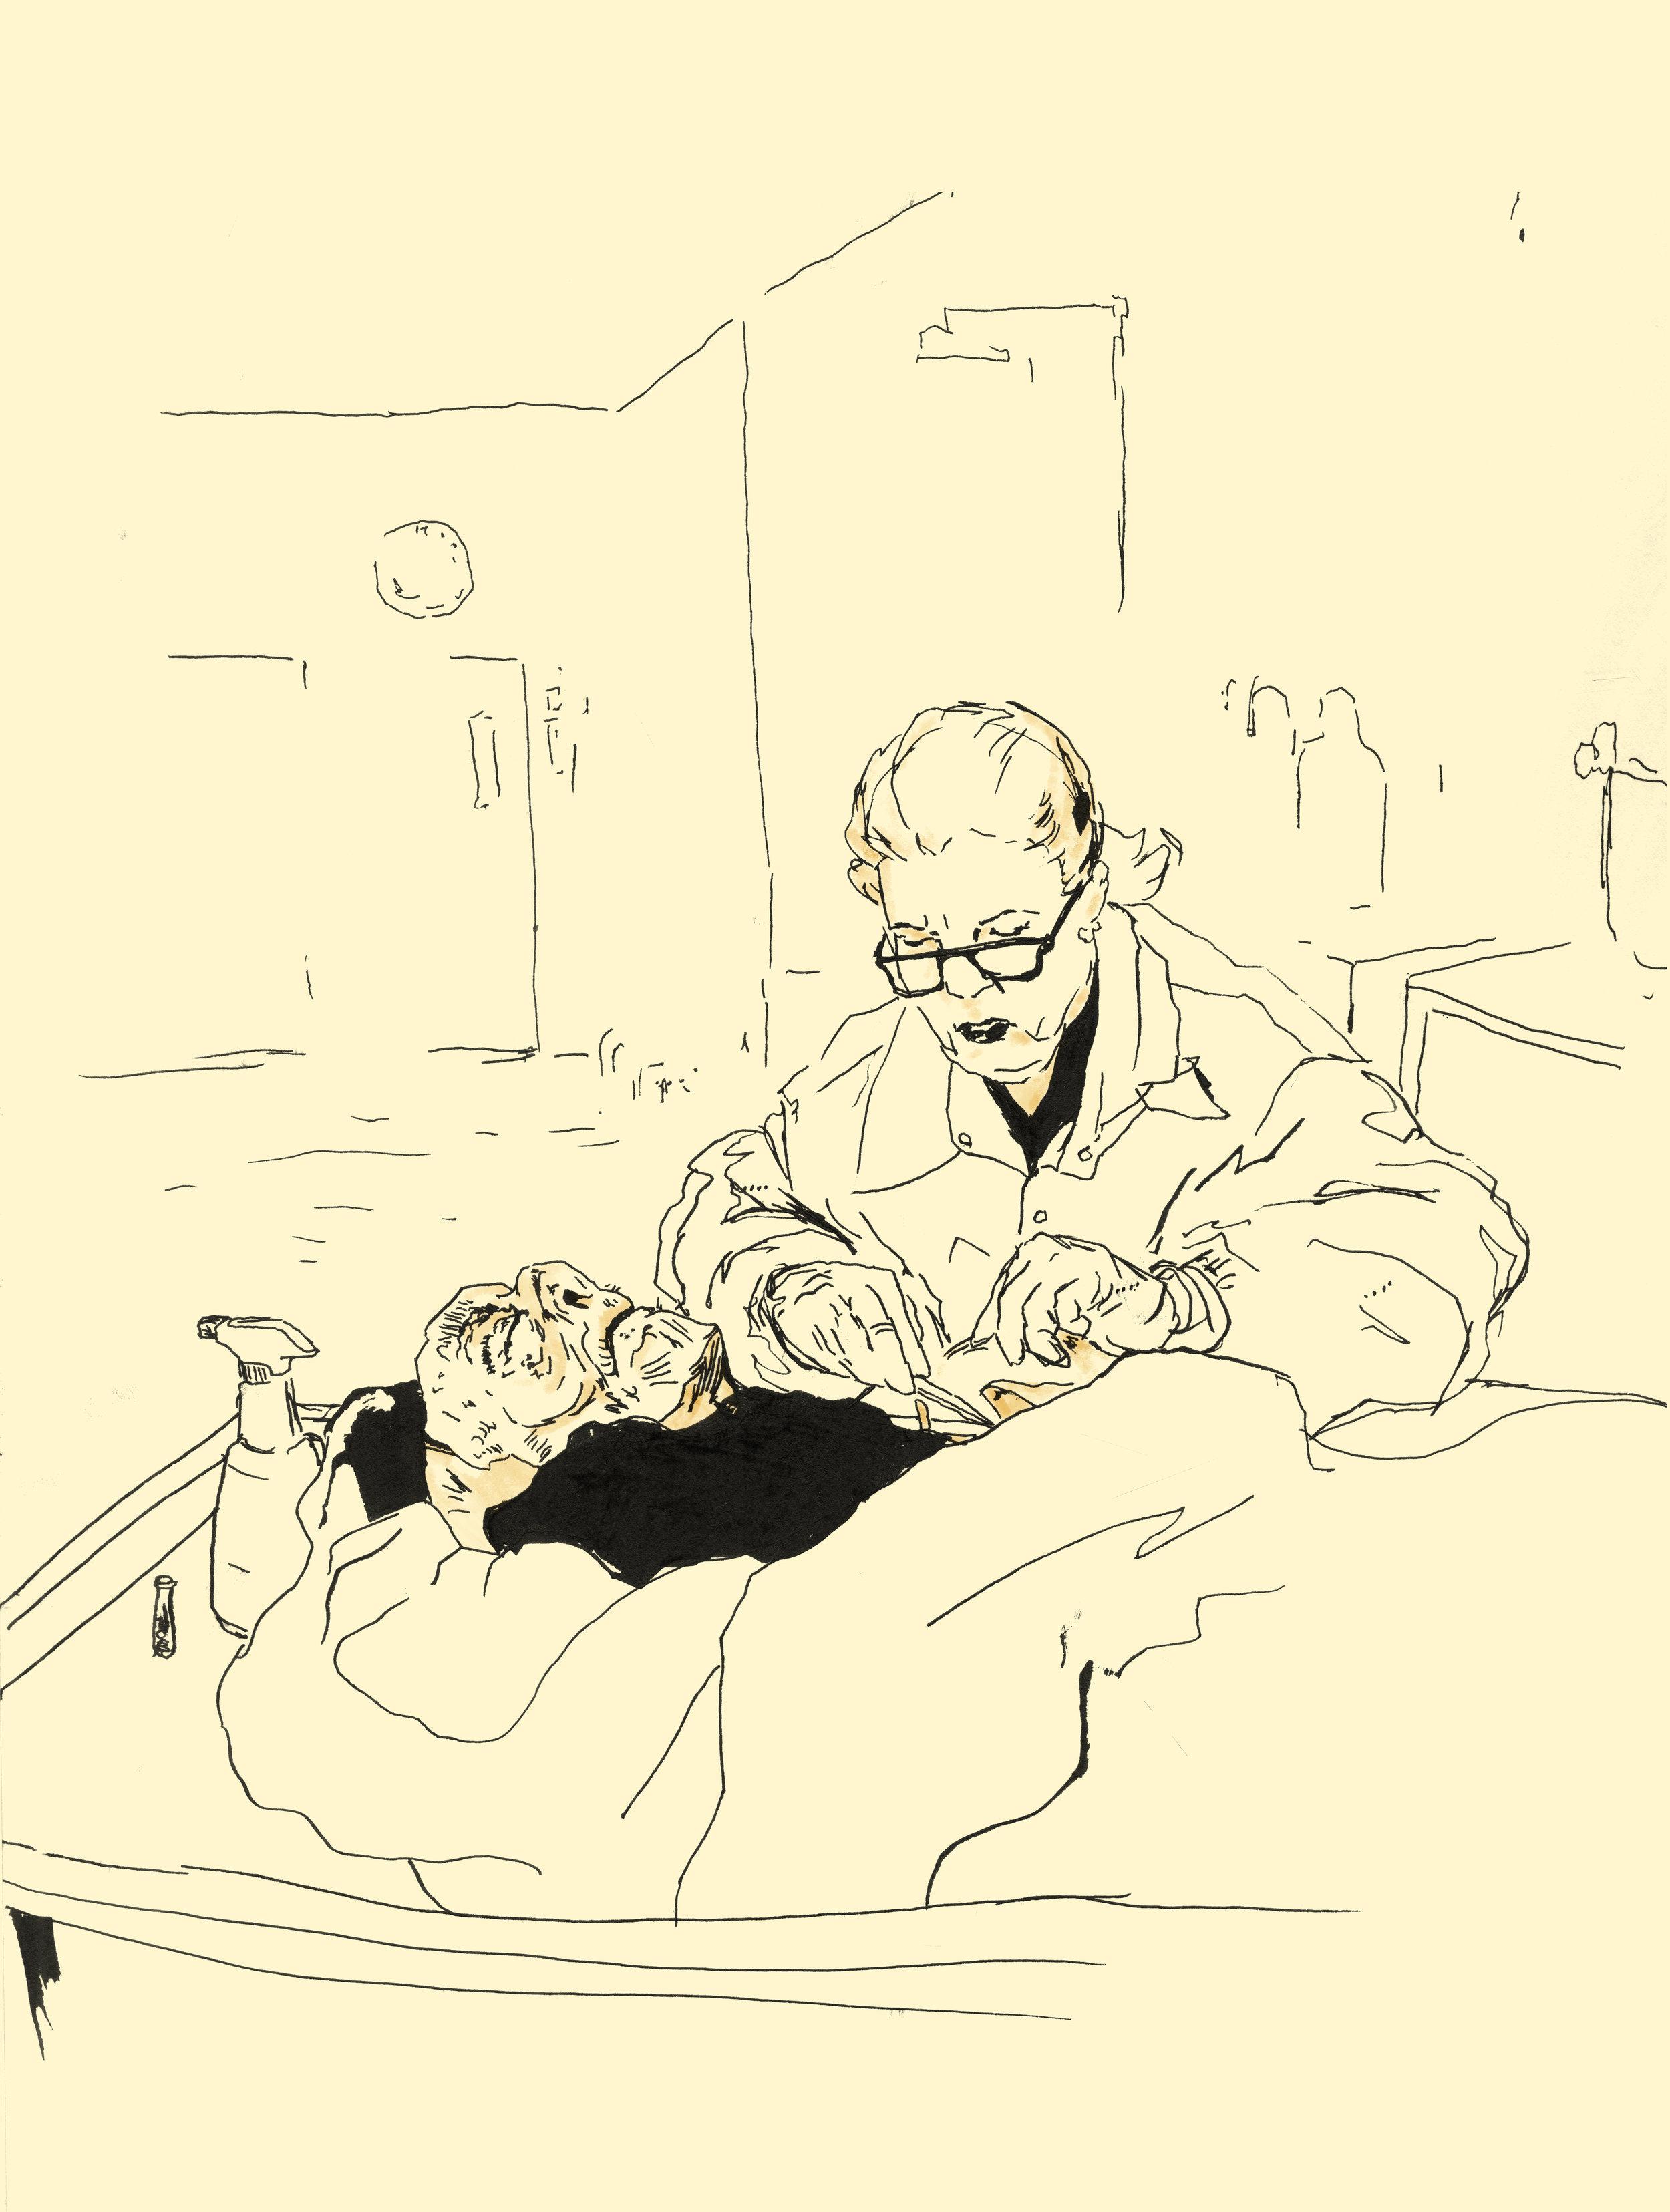 Touro - Dr.jpg